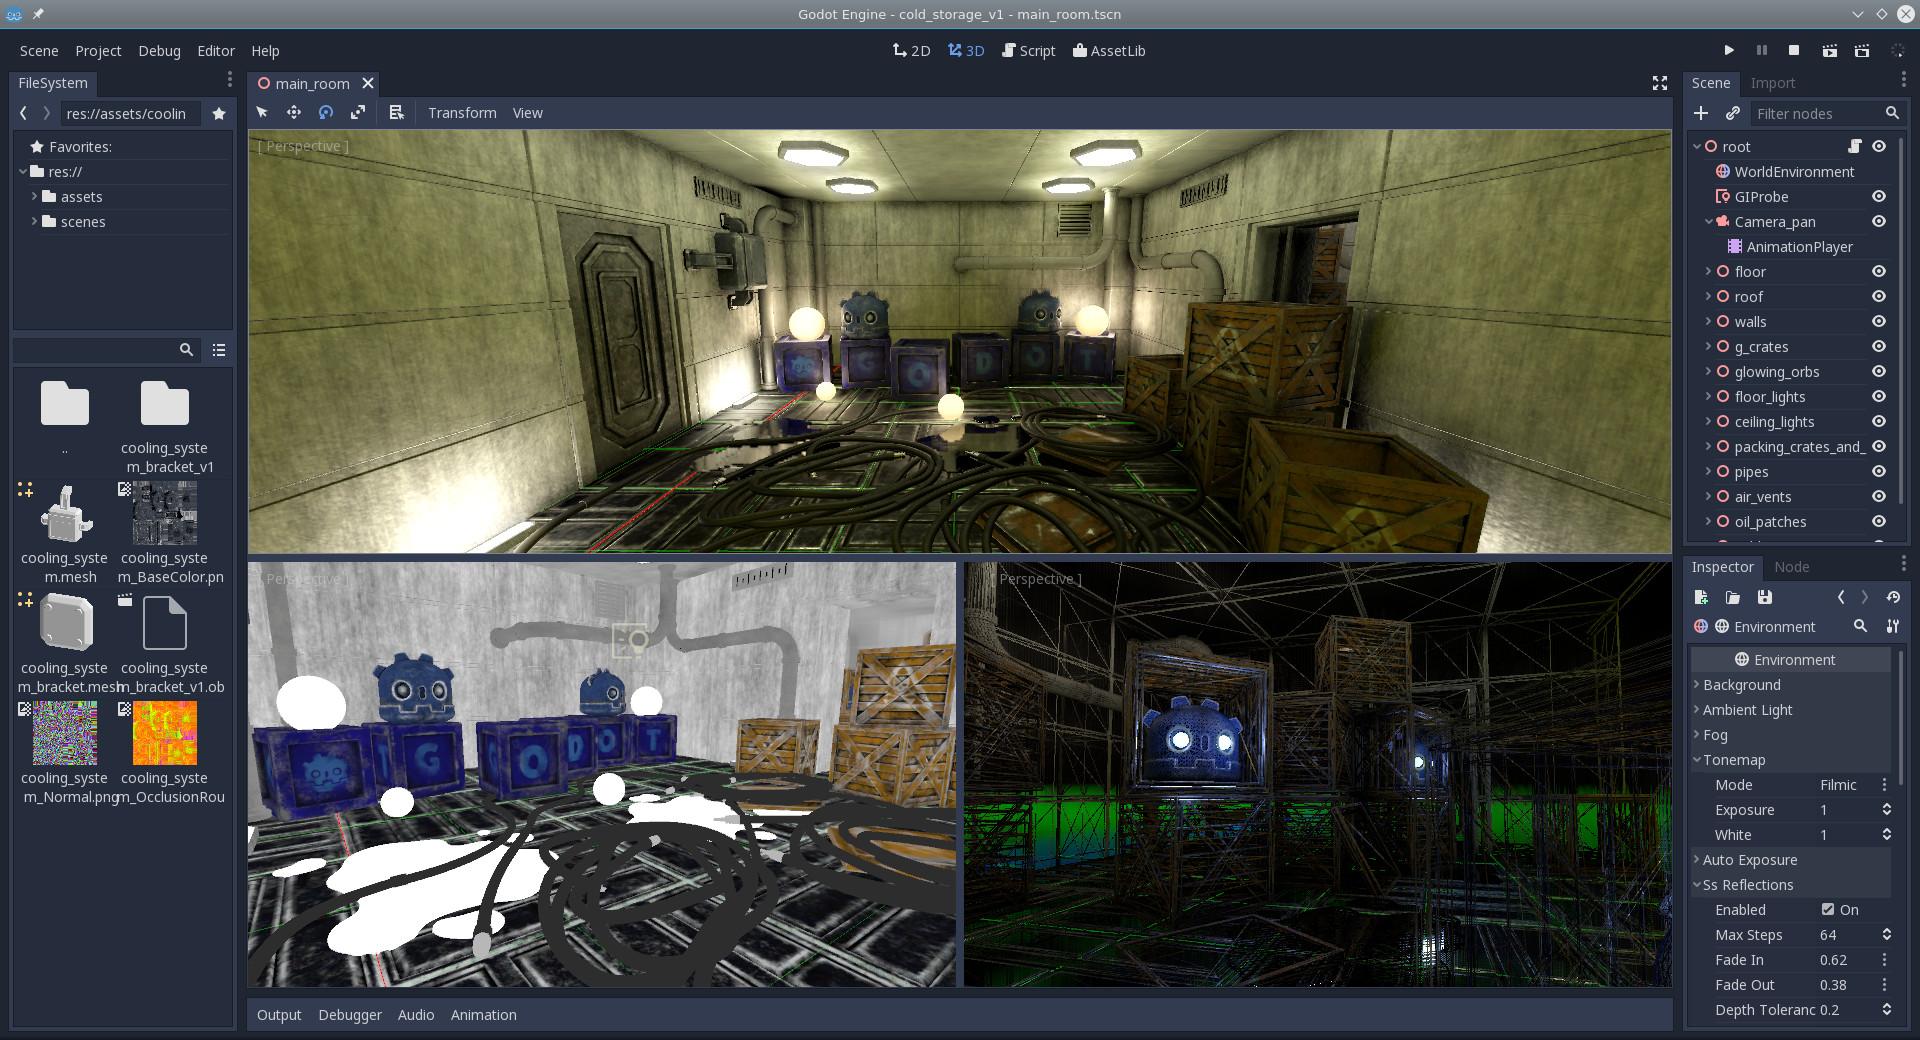 Screenshot of a 3D scene in Godot Engine